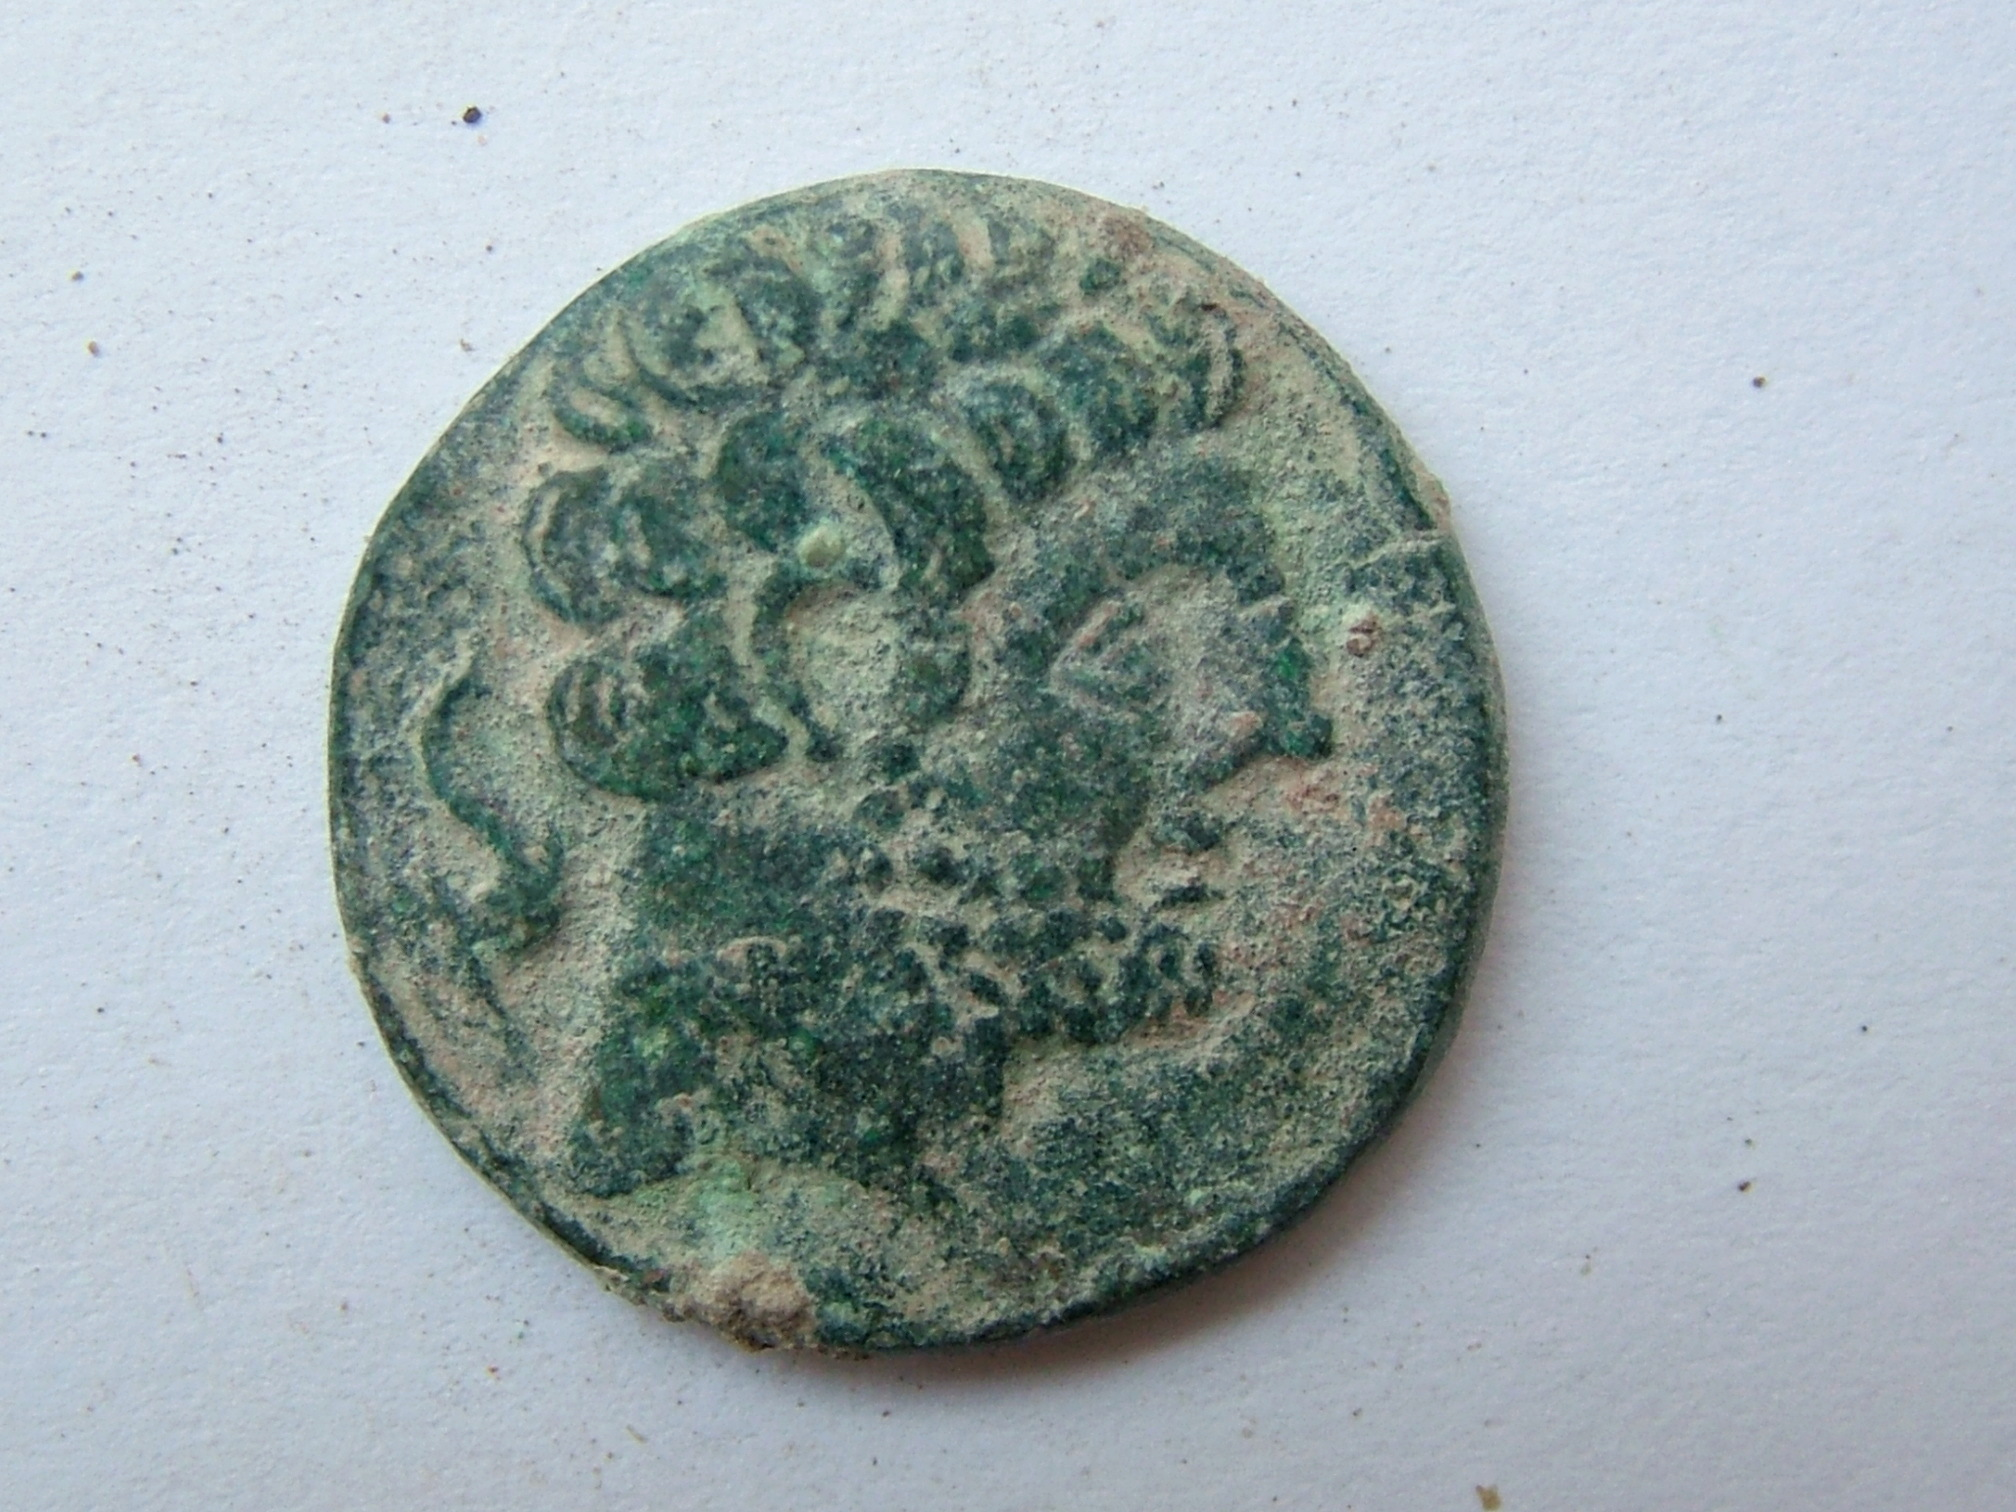 Imágenes a gran escala de pátinas y monedas falsas. Escalofriante (+18). 01_bol10